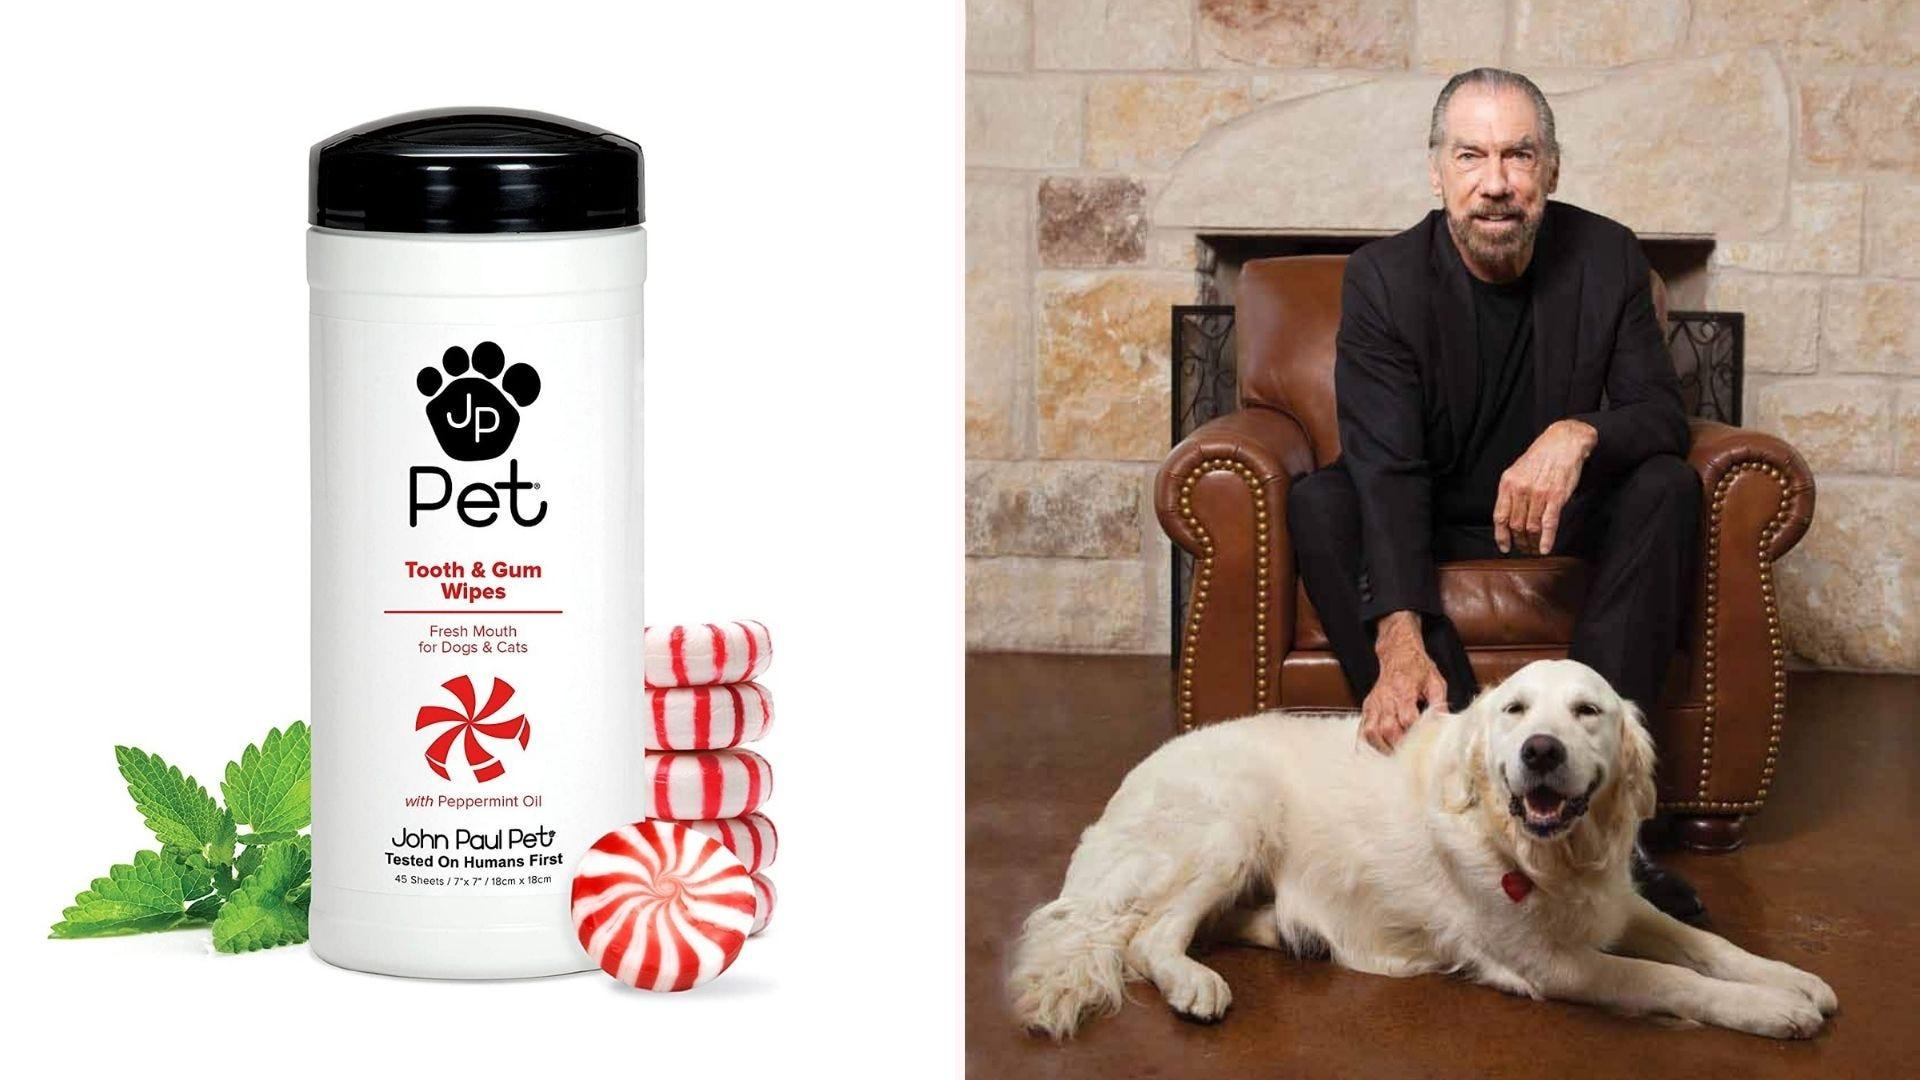 John Paul Pets dental wipes and John Paul with his dog.